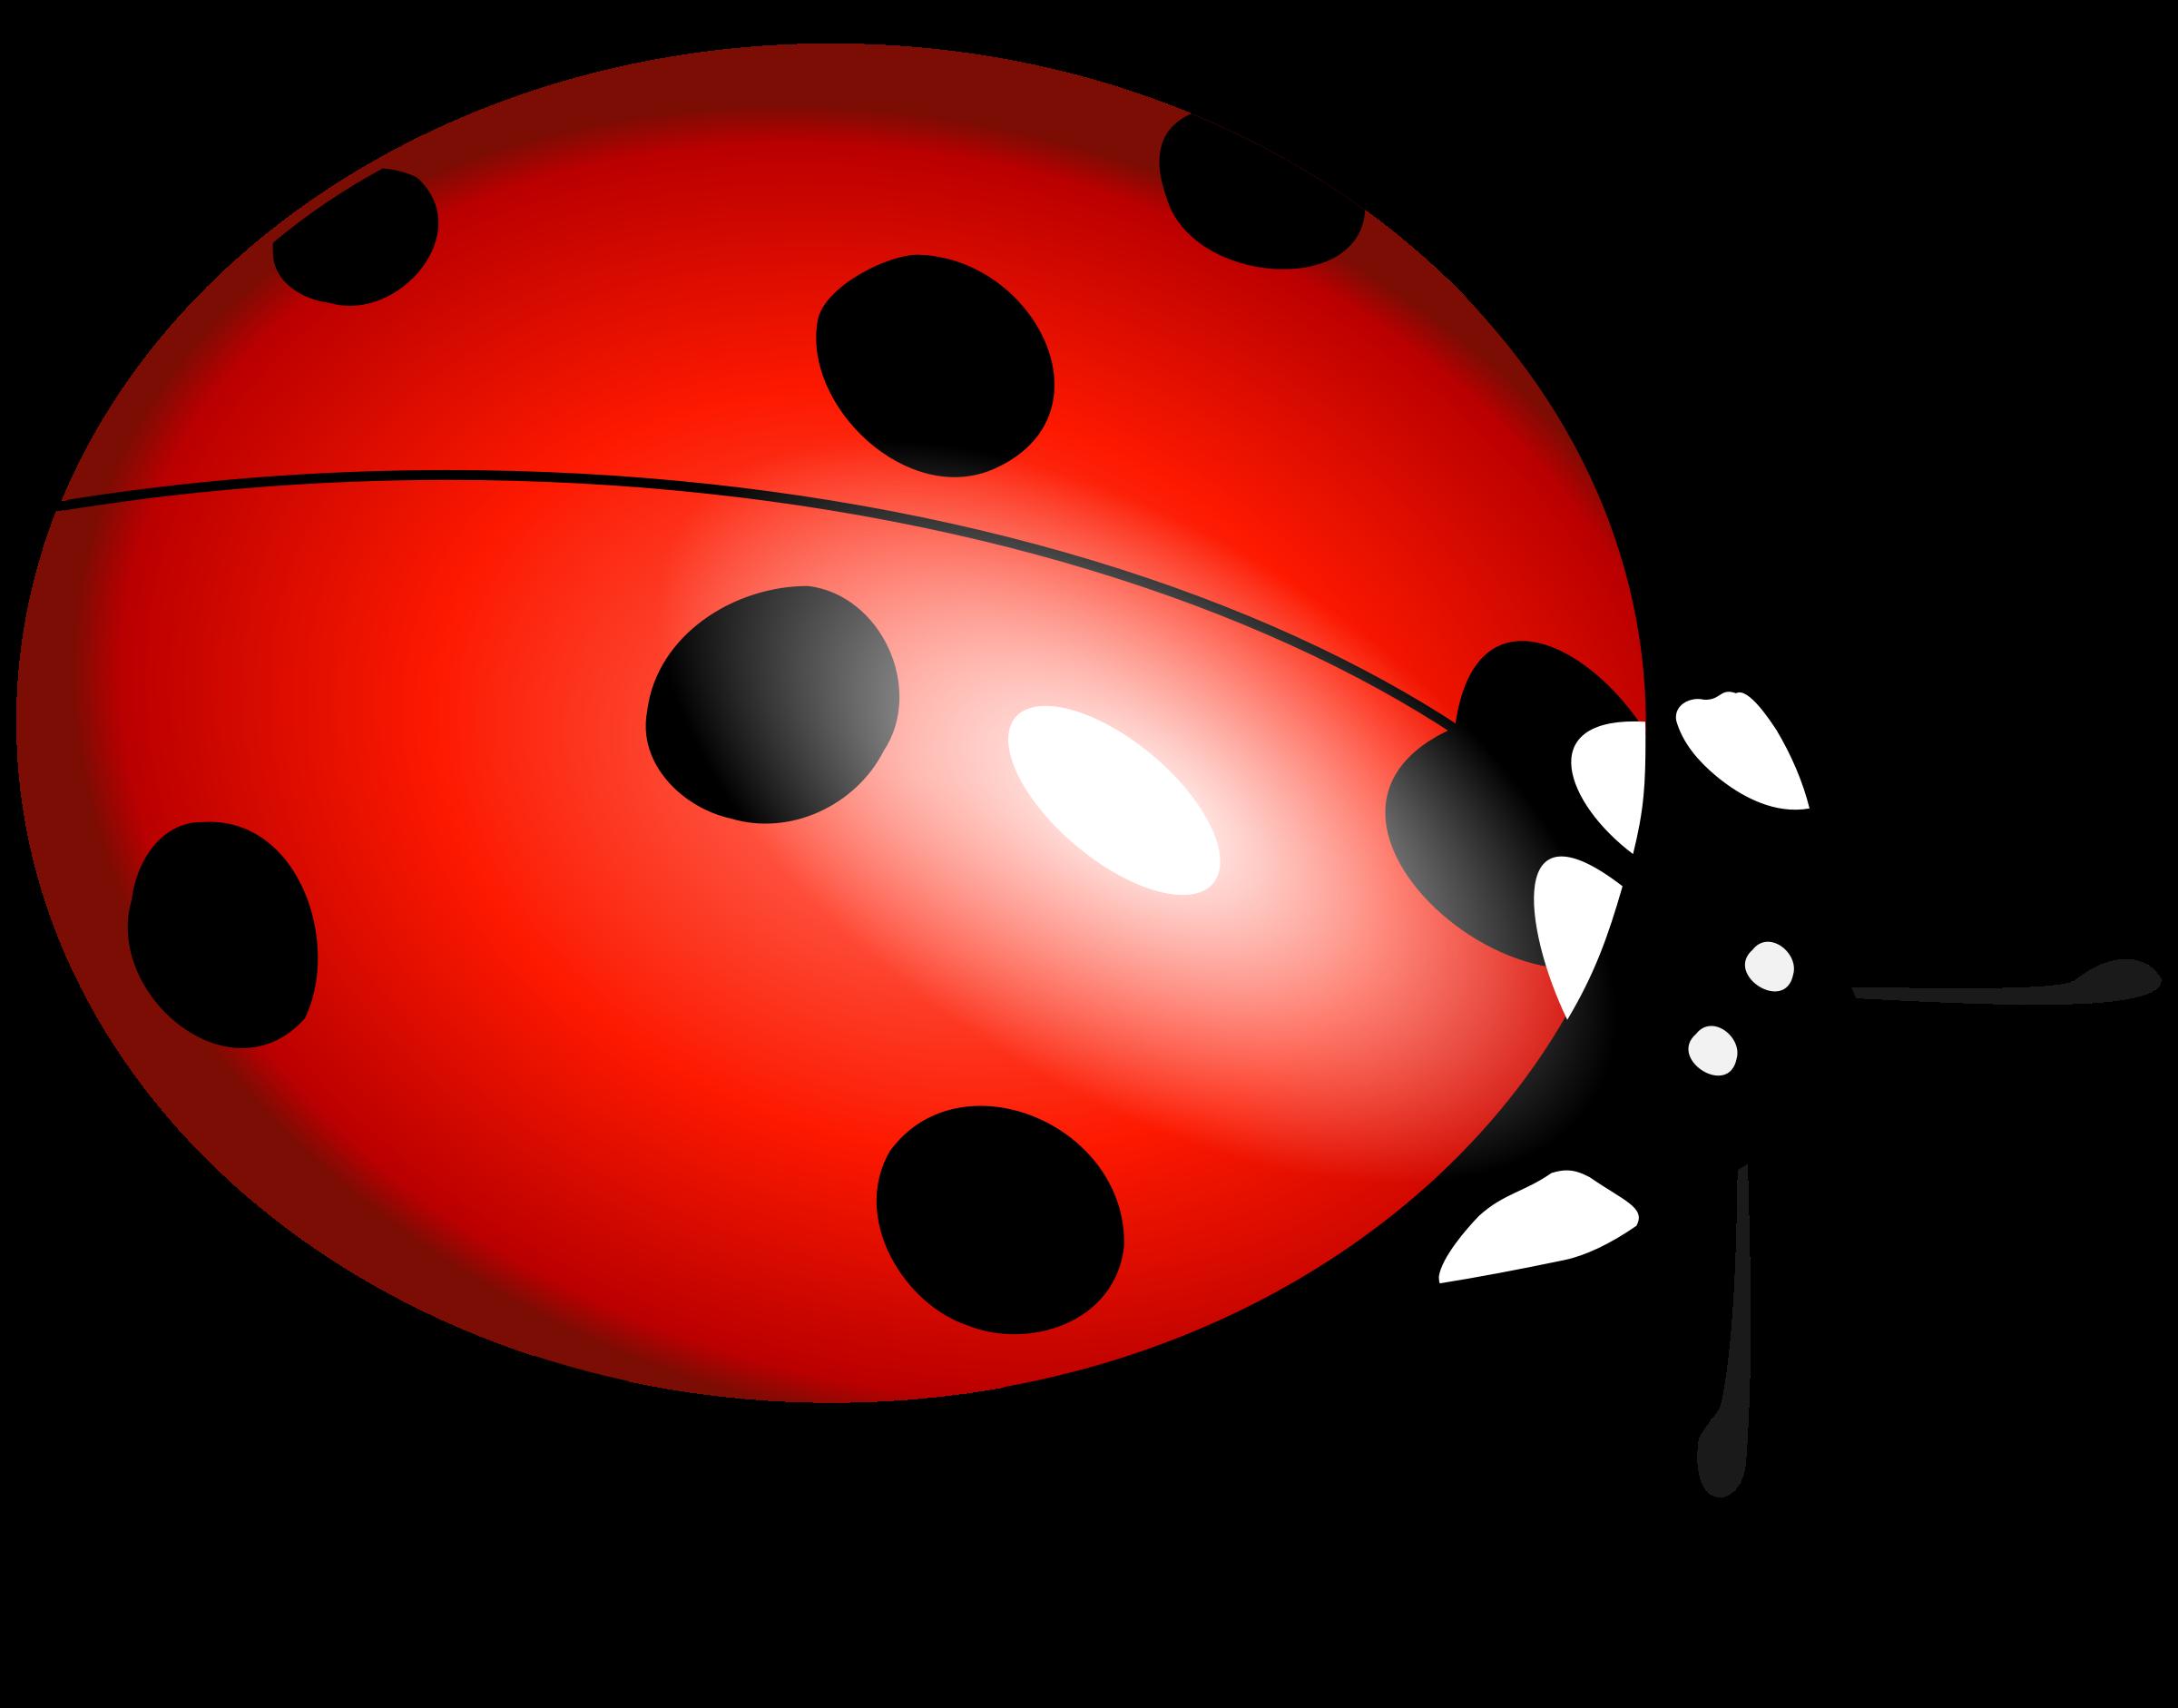 Ladybug HD PNG - 90623